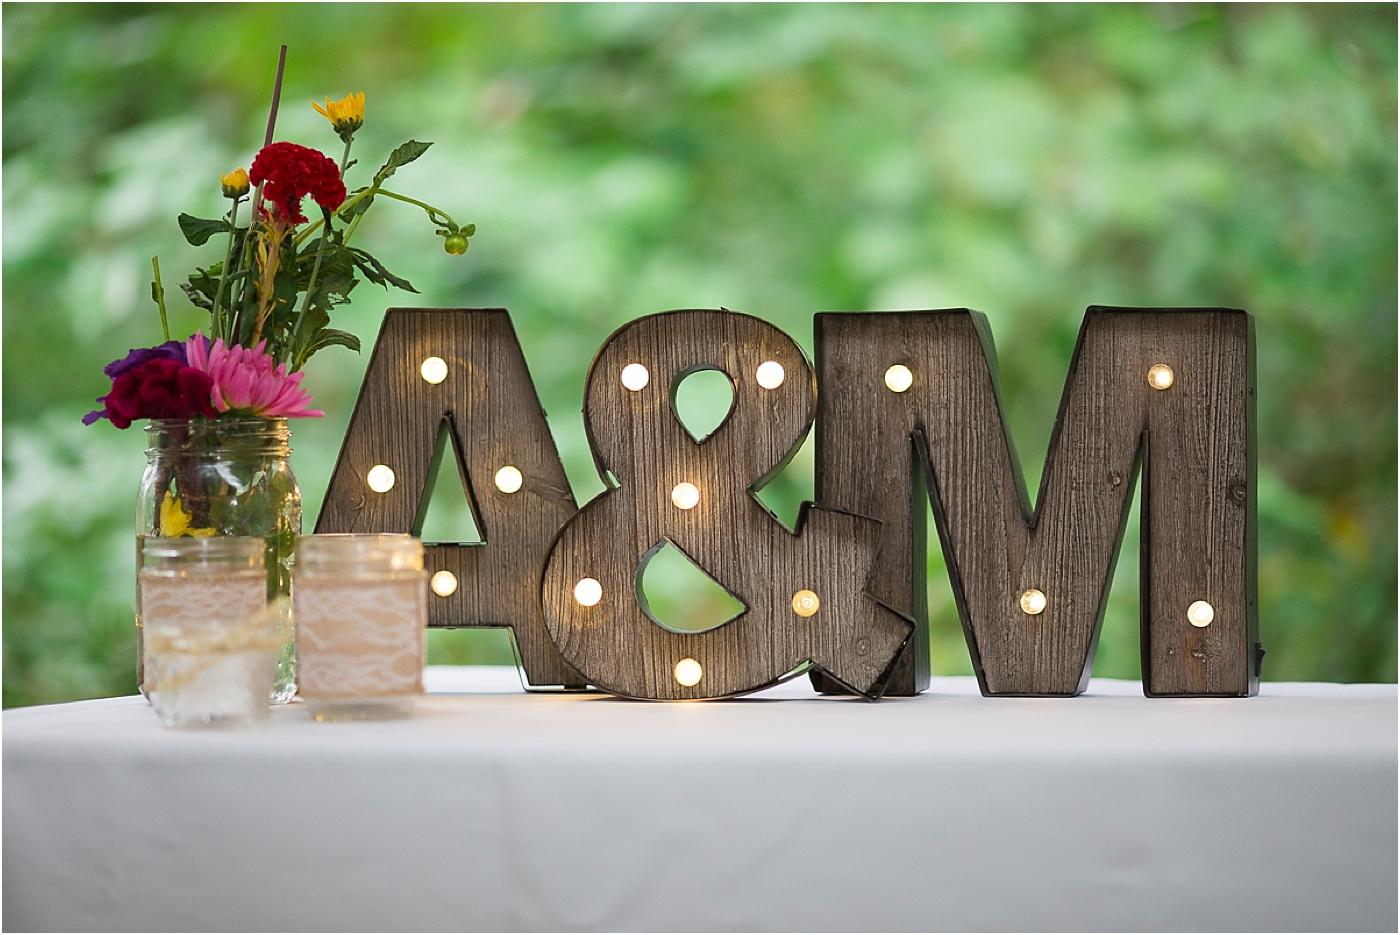 Annie-Mike-Backyard-Wedding-12.jpg